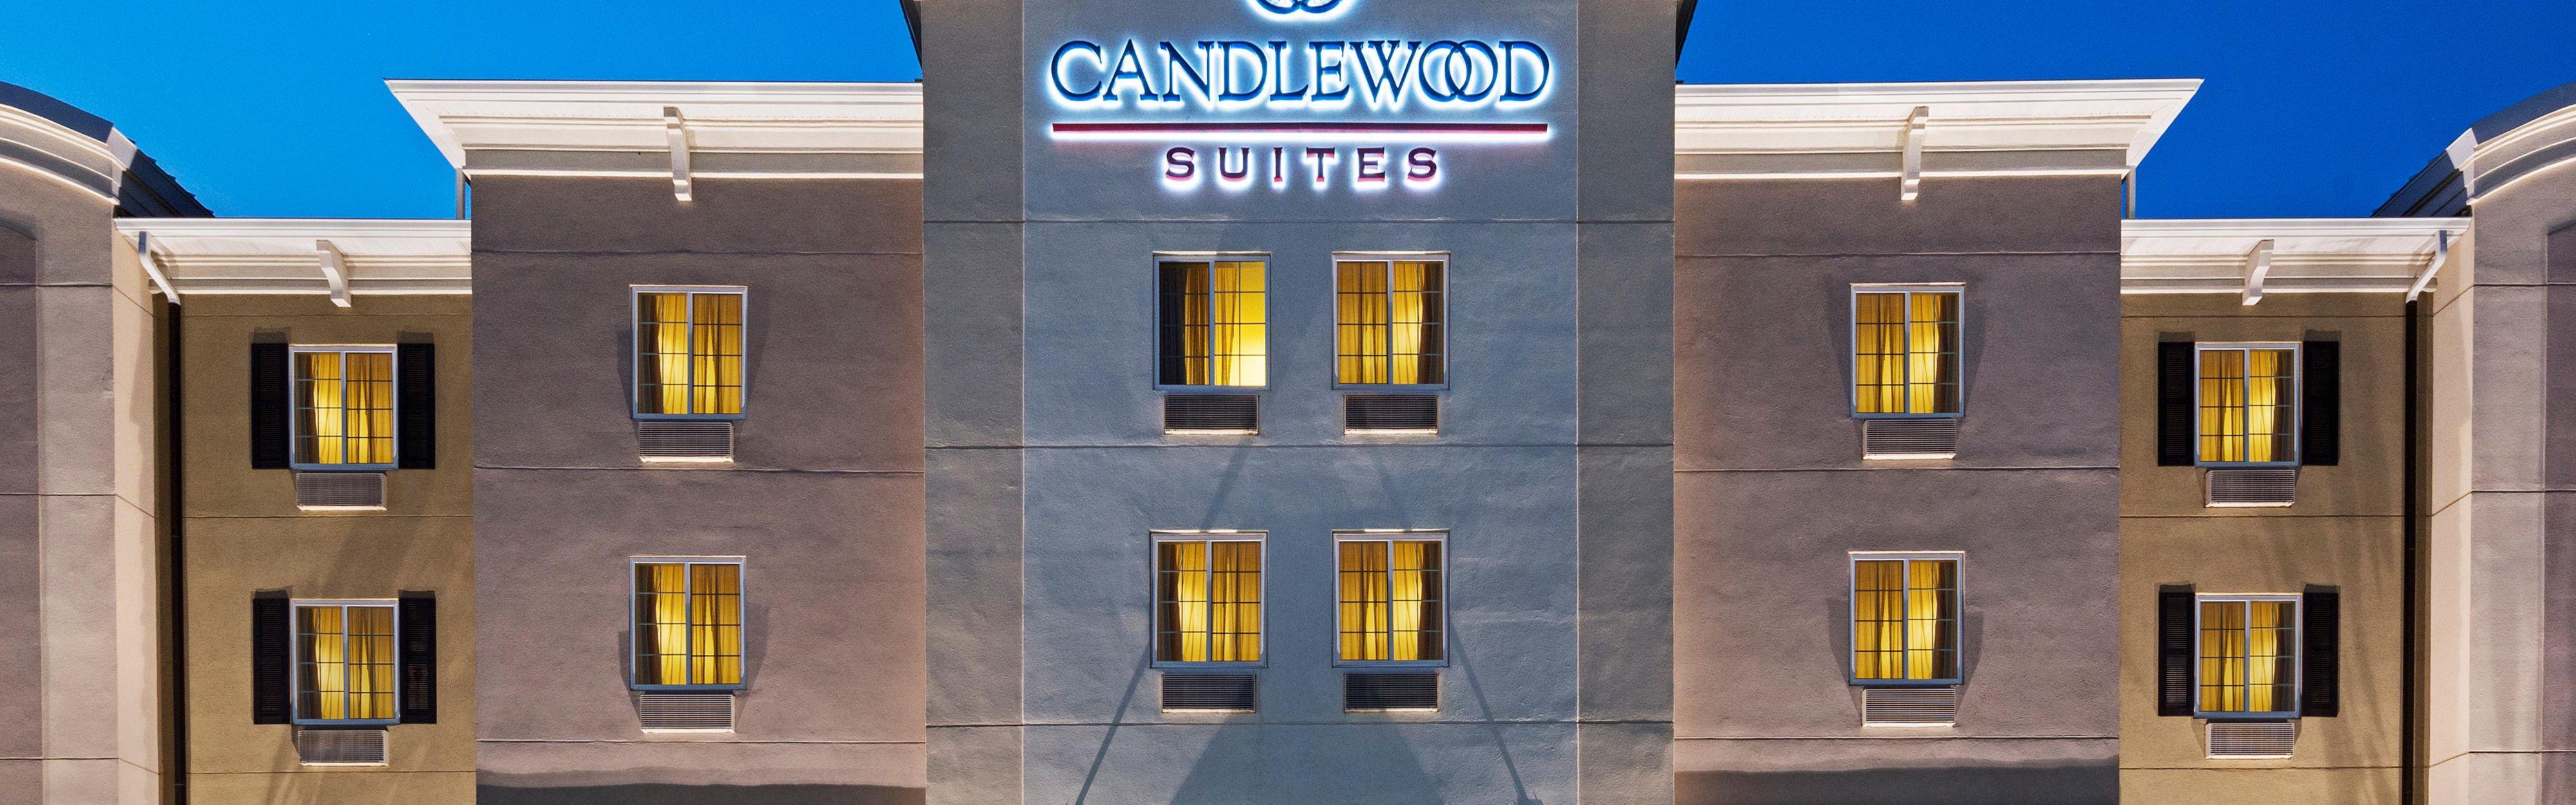 Candlewood Suites Alexandria West image 0